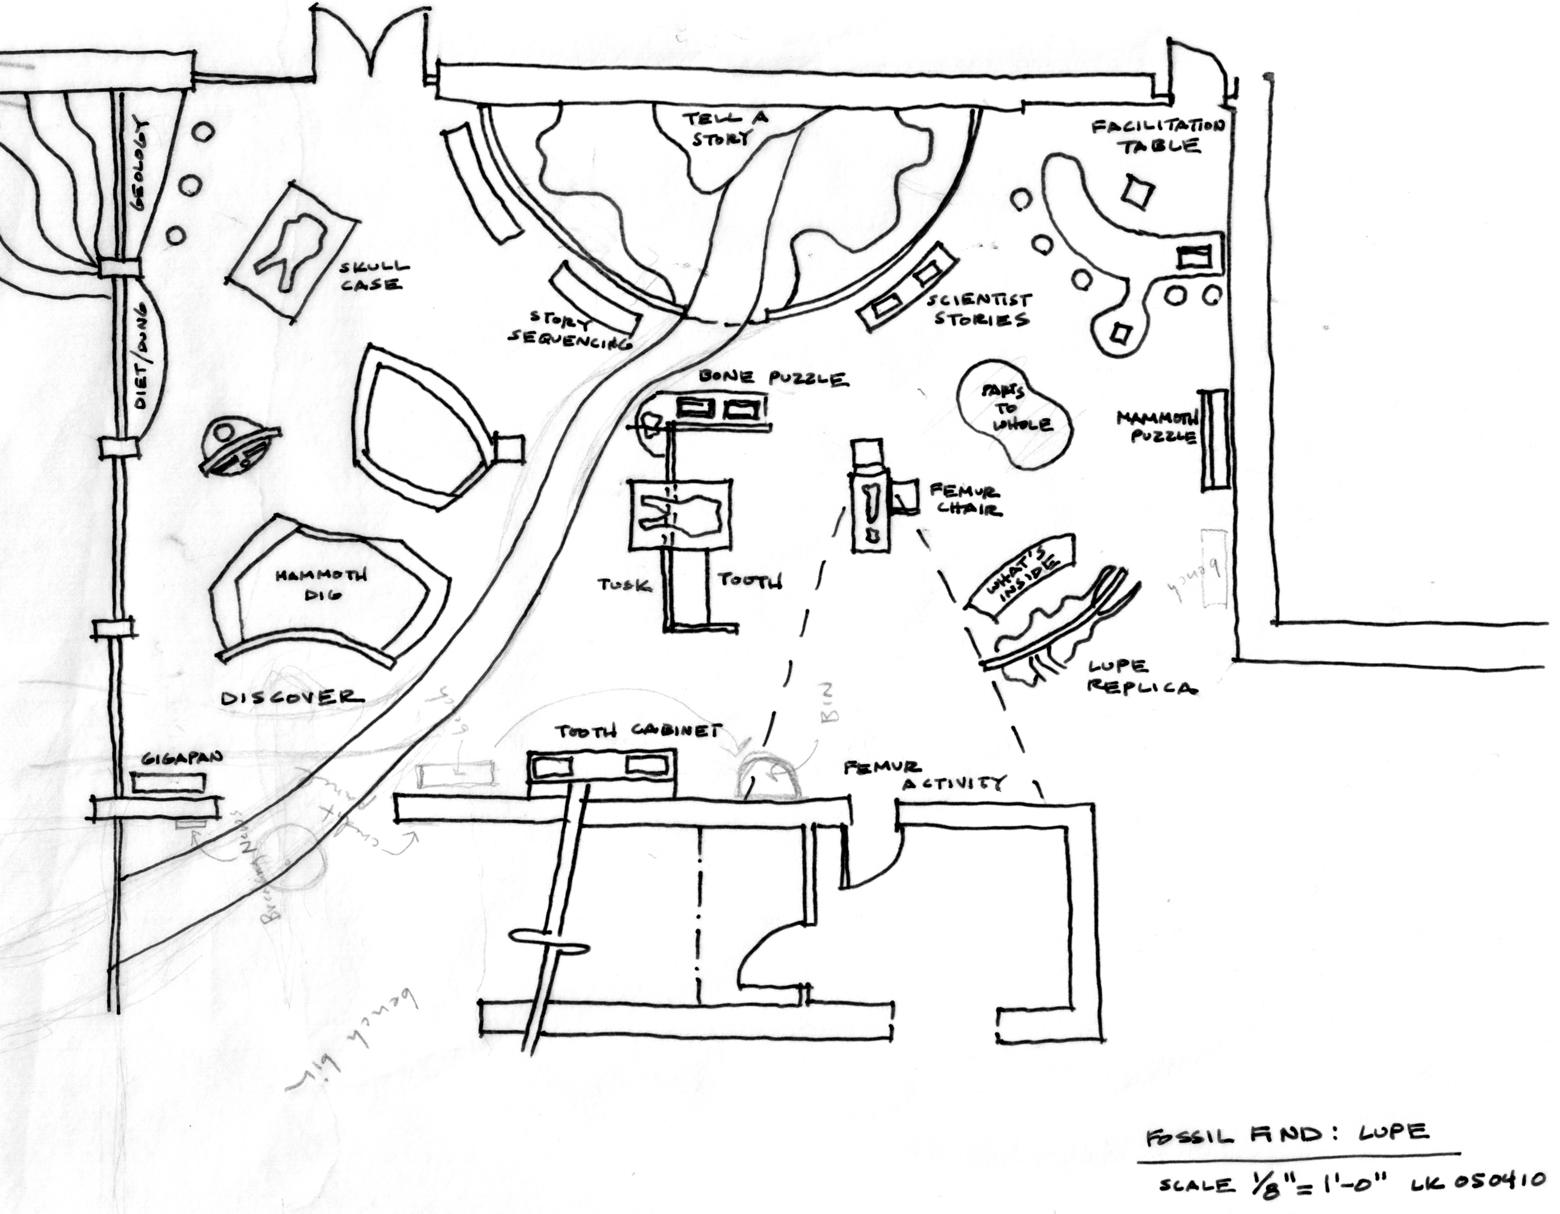 museum exhibit floor plan sketch coloring page view template